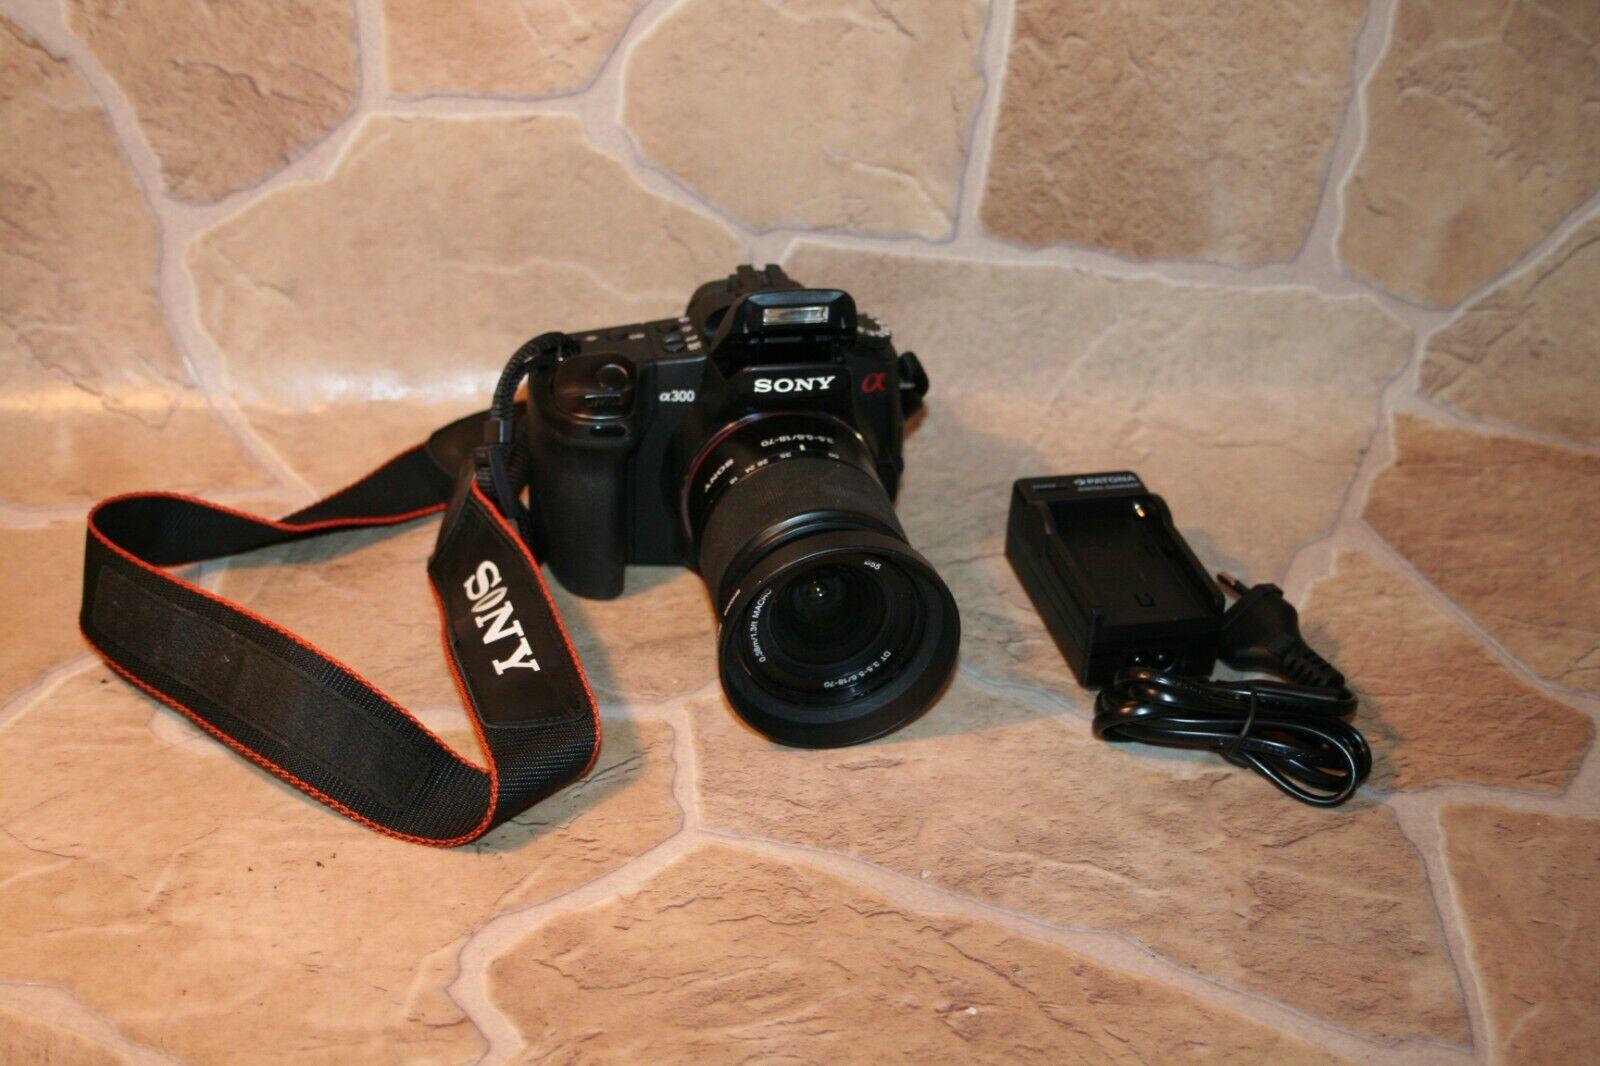 Sony Alpha 300 DSLR-A300 Digitale Spiegelreflex Kamera